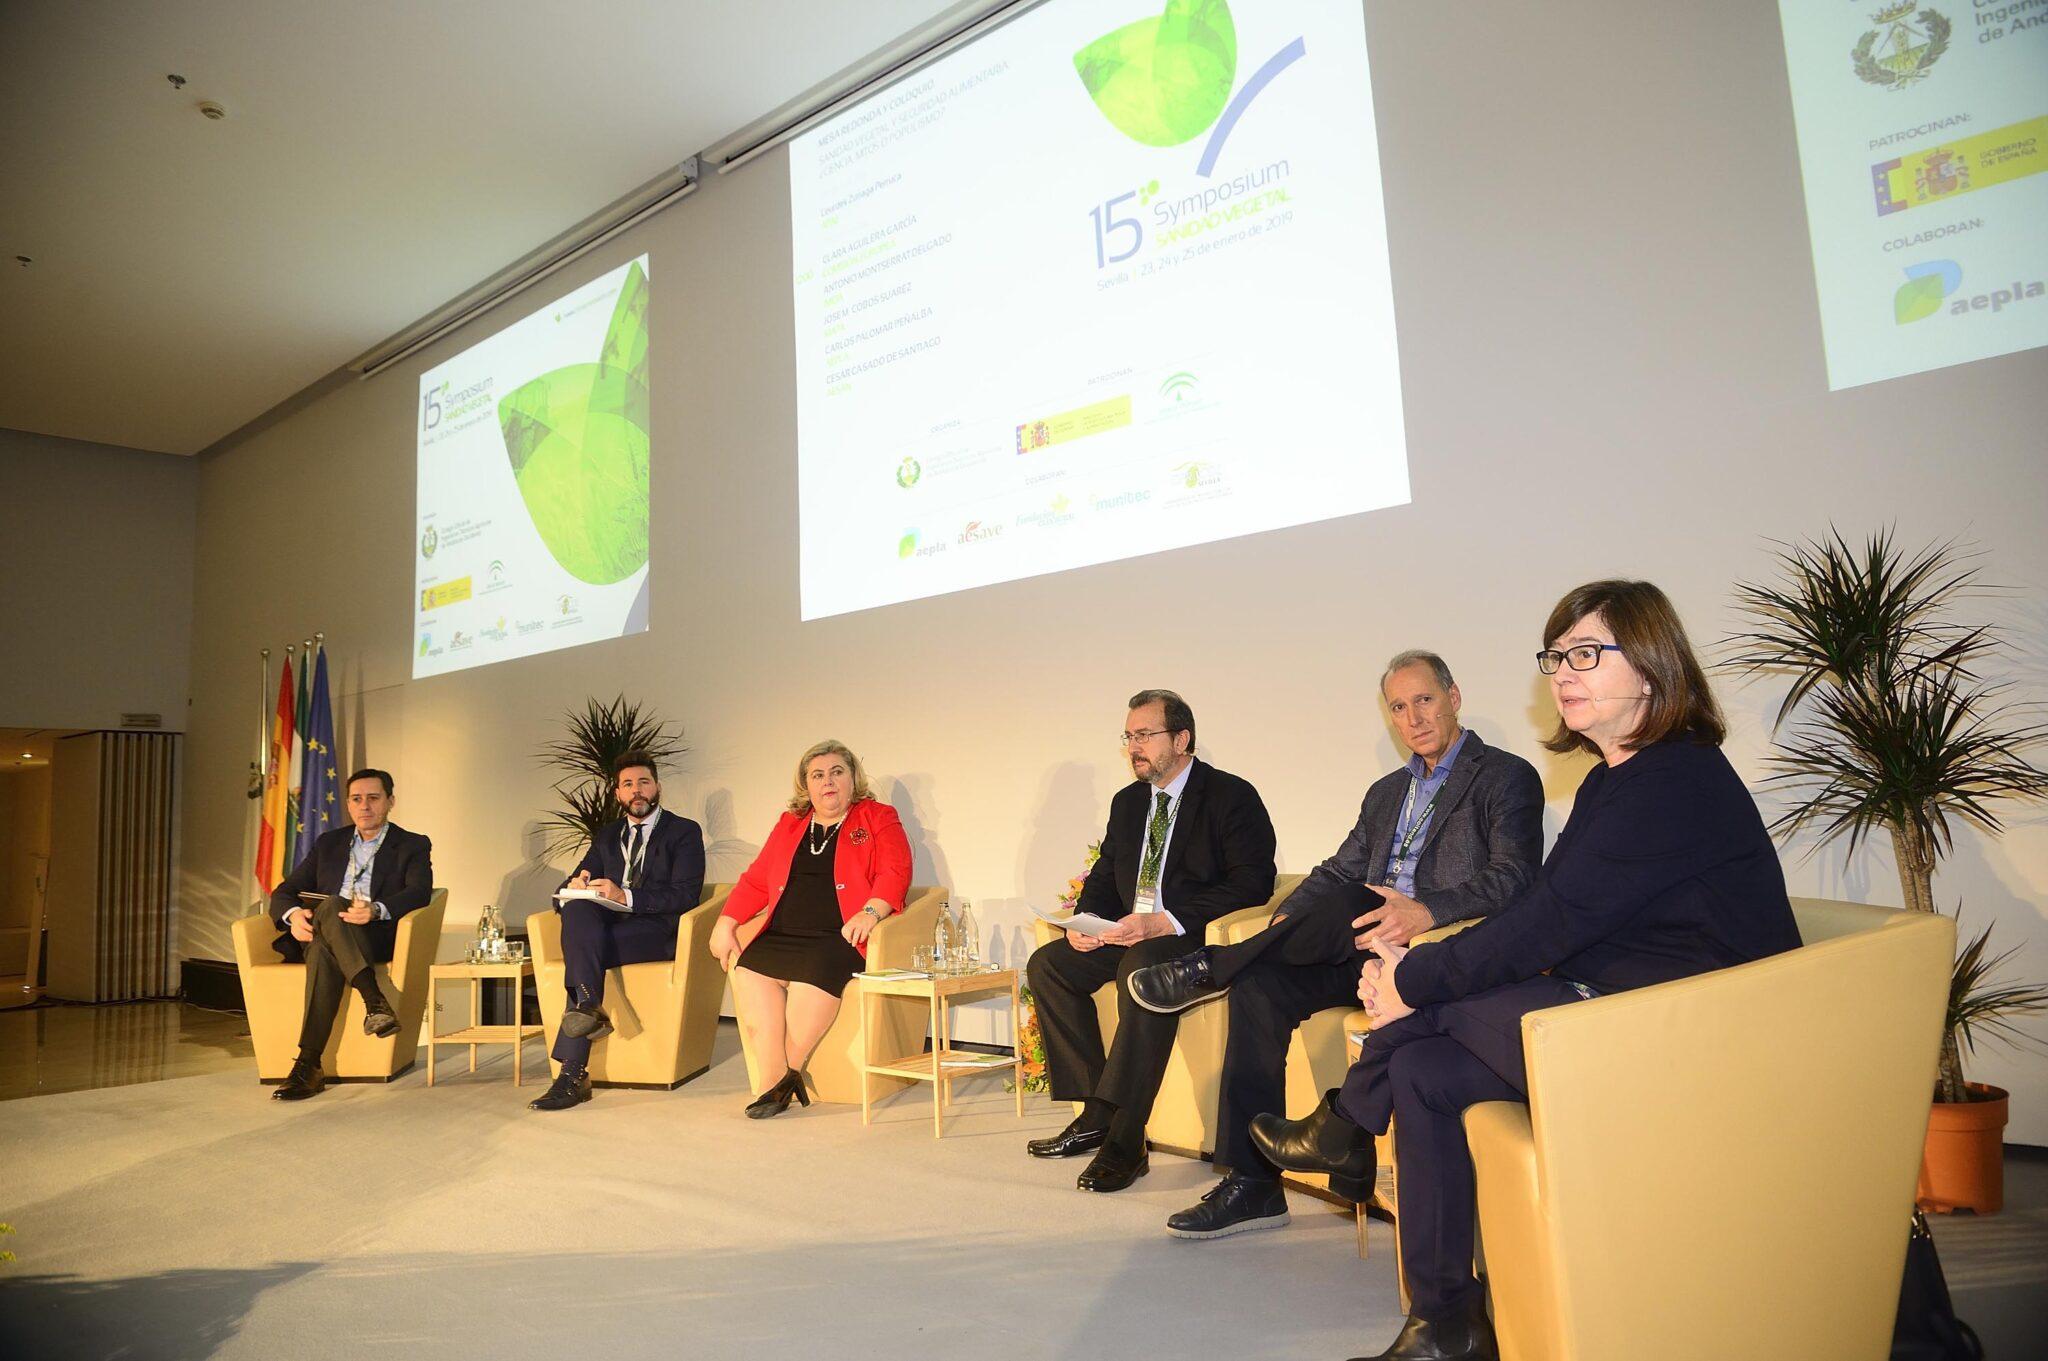 15º Symposium Sanidad Vegetal